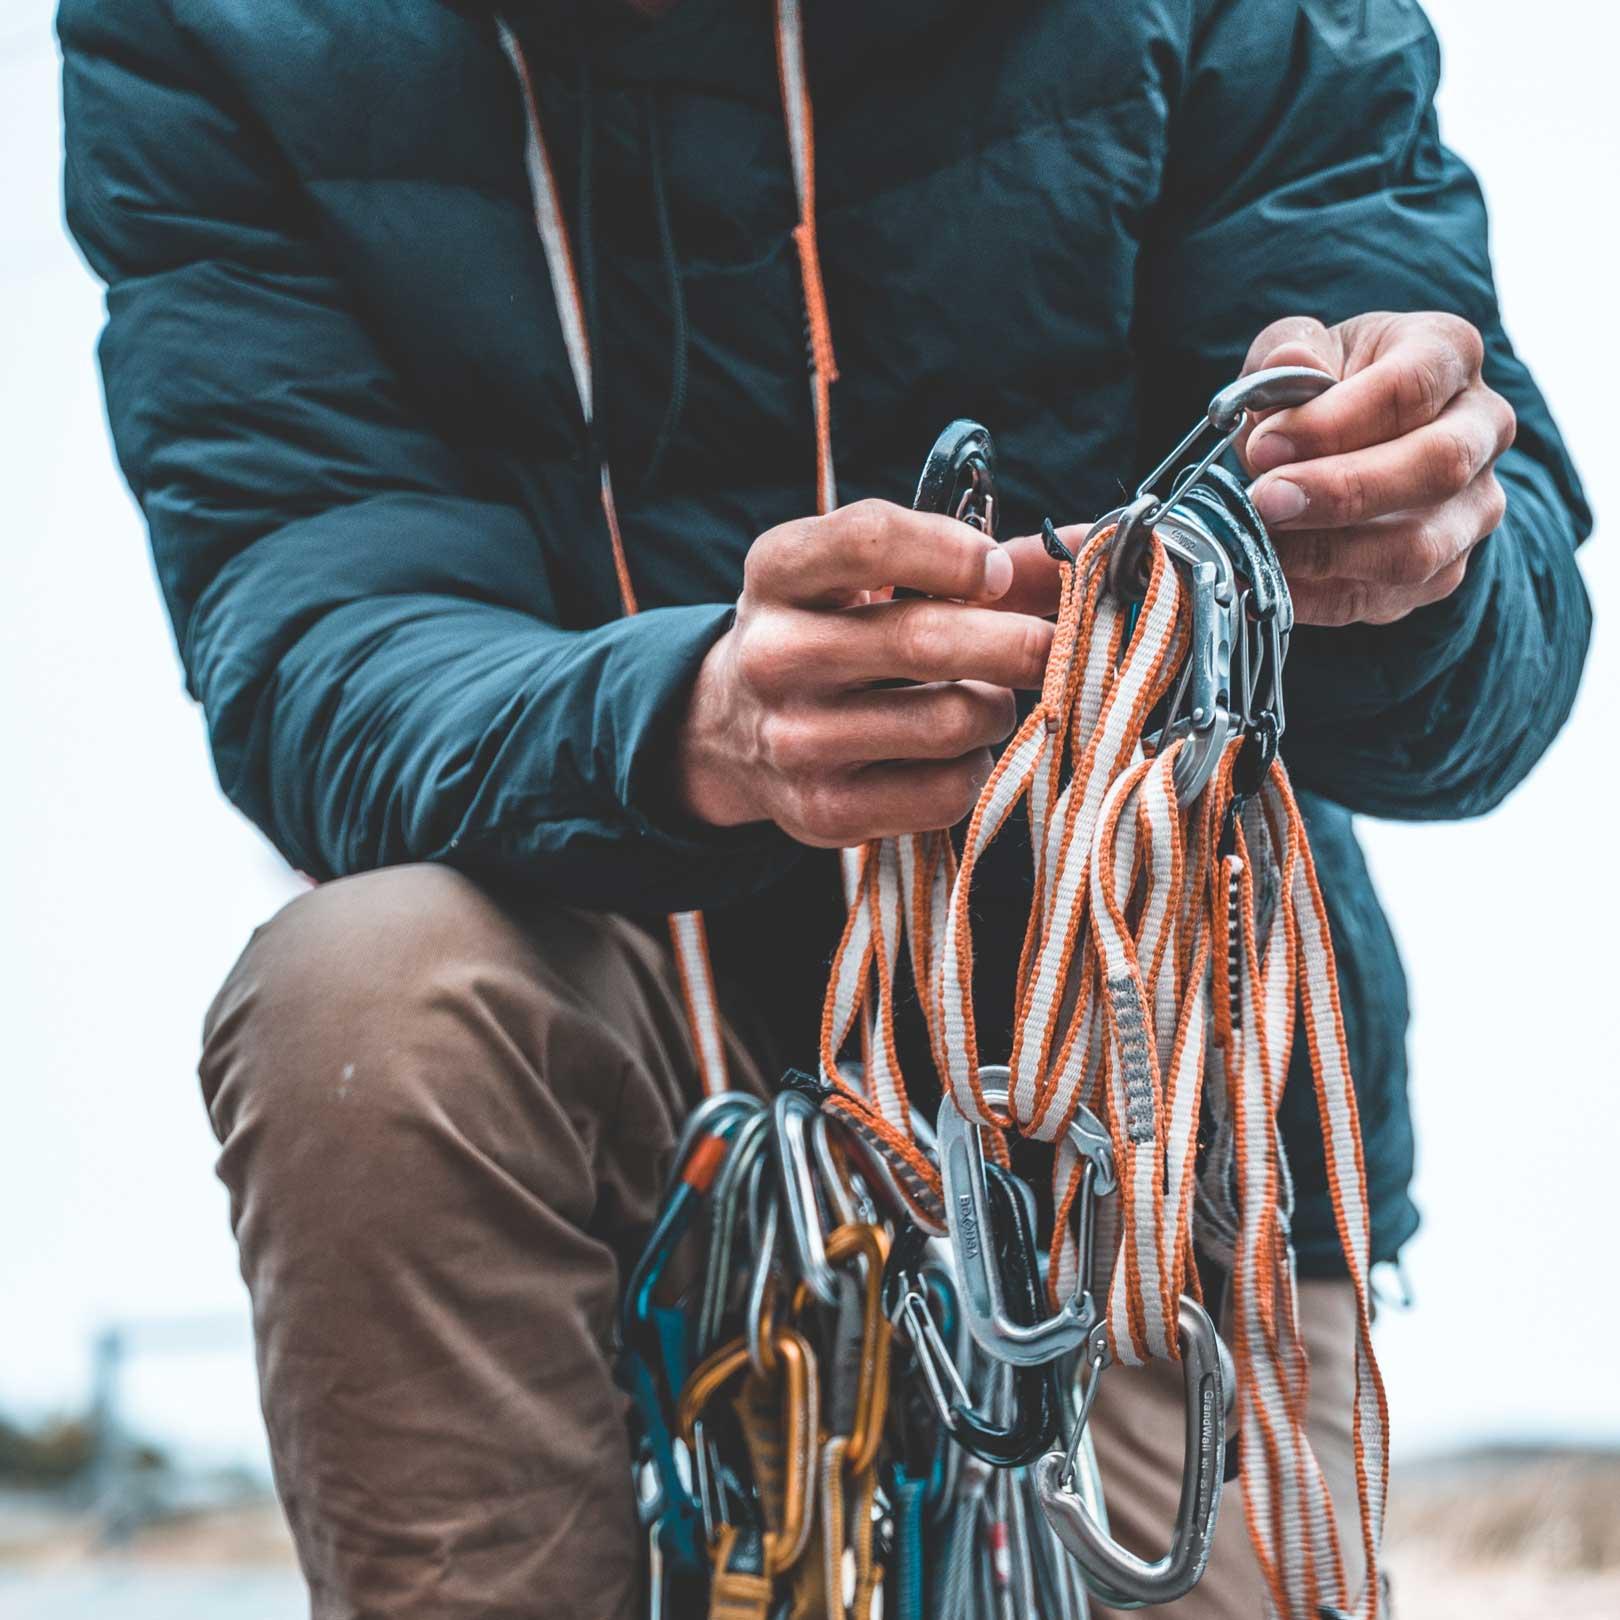 Man organizing climbing gear while wearing Robson Down Hoody